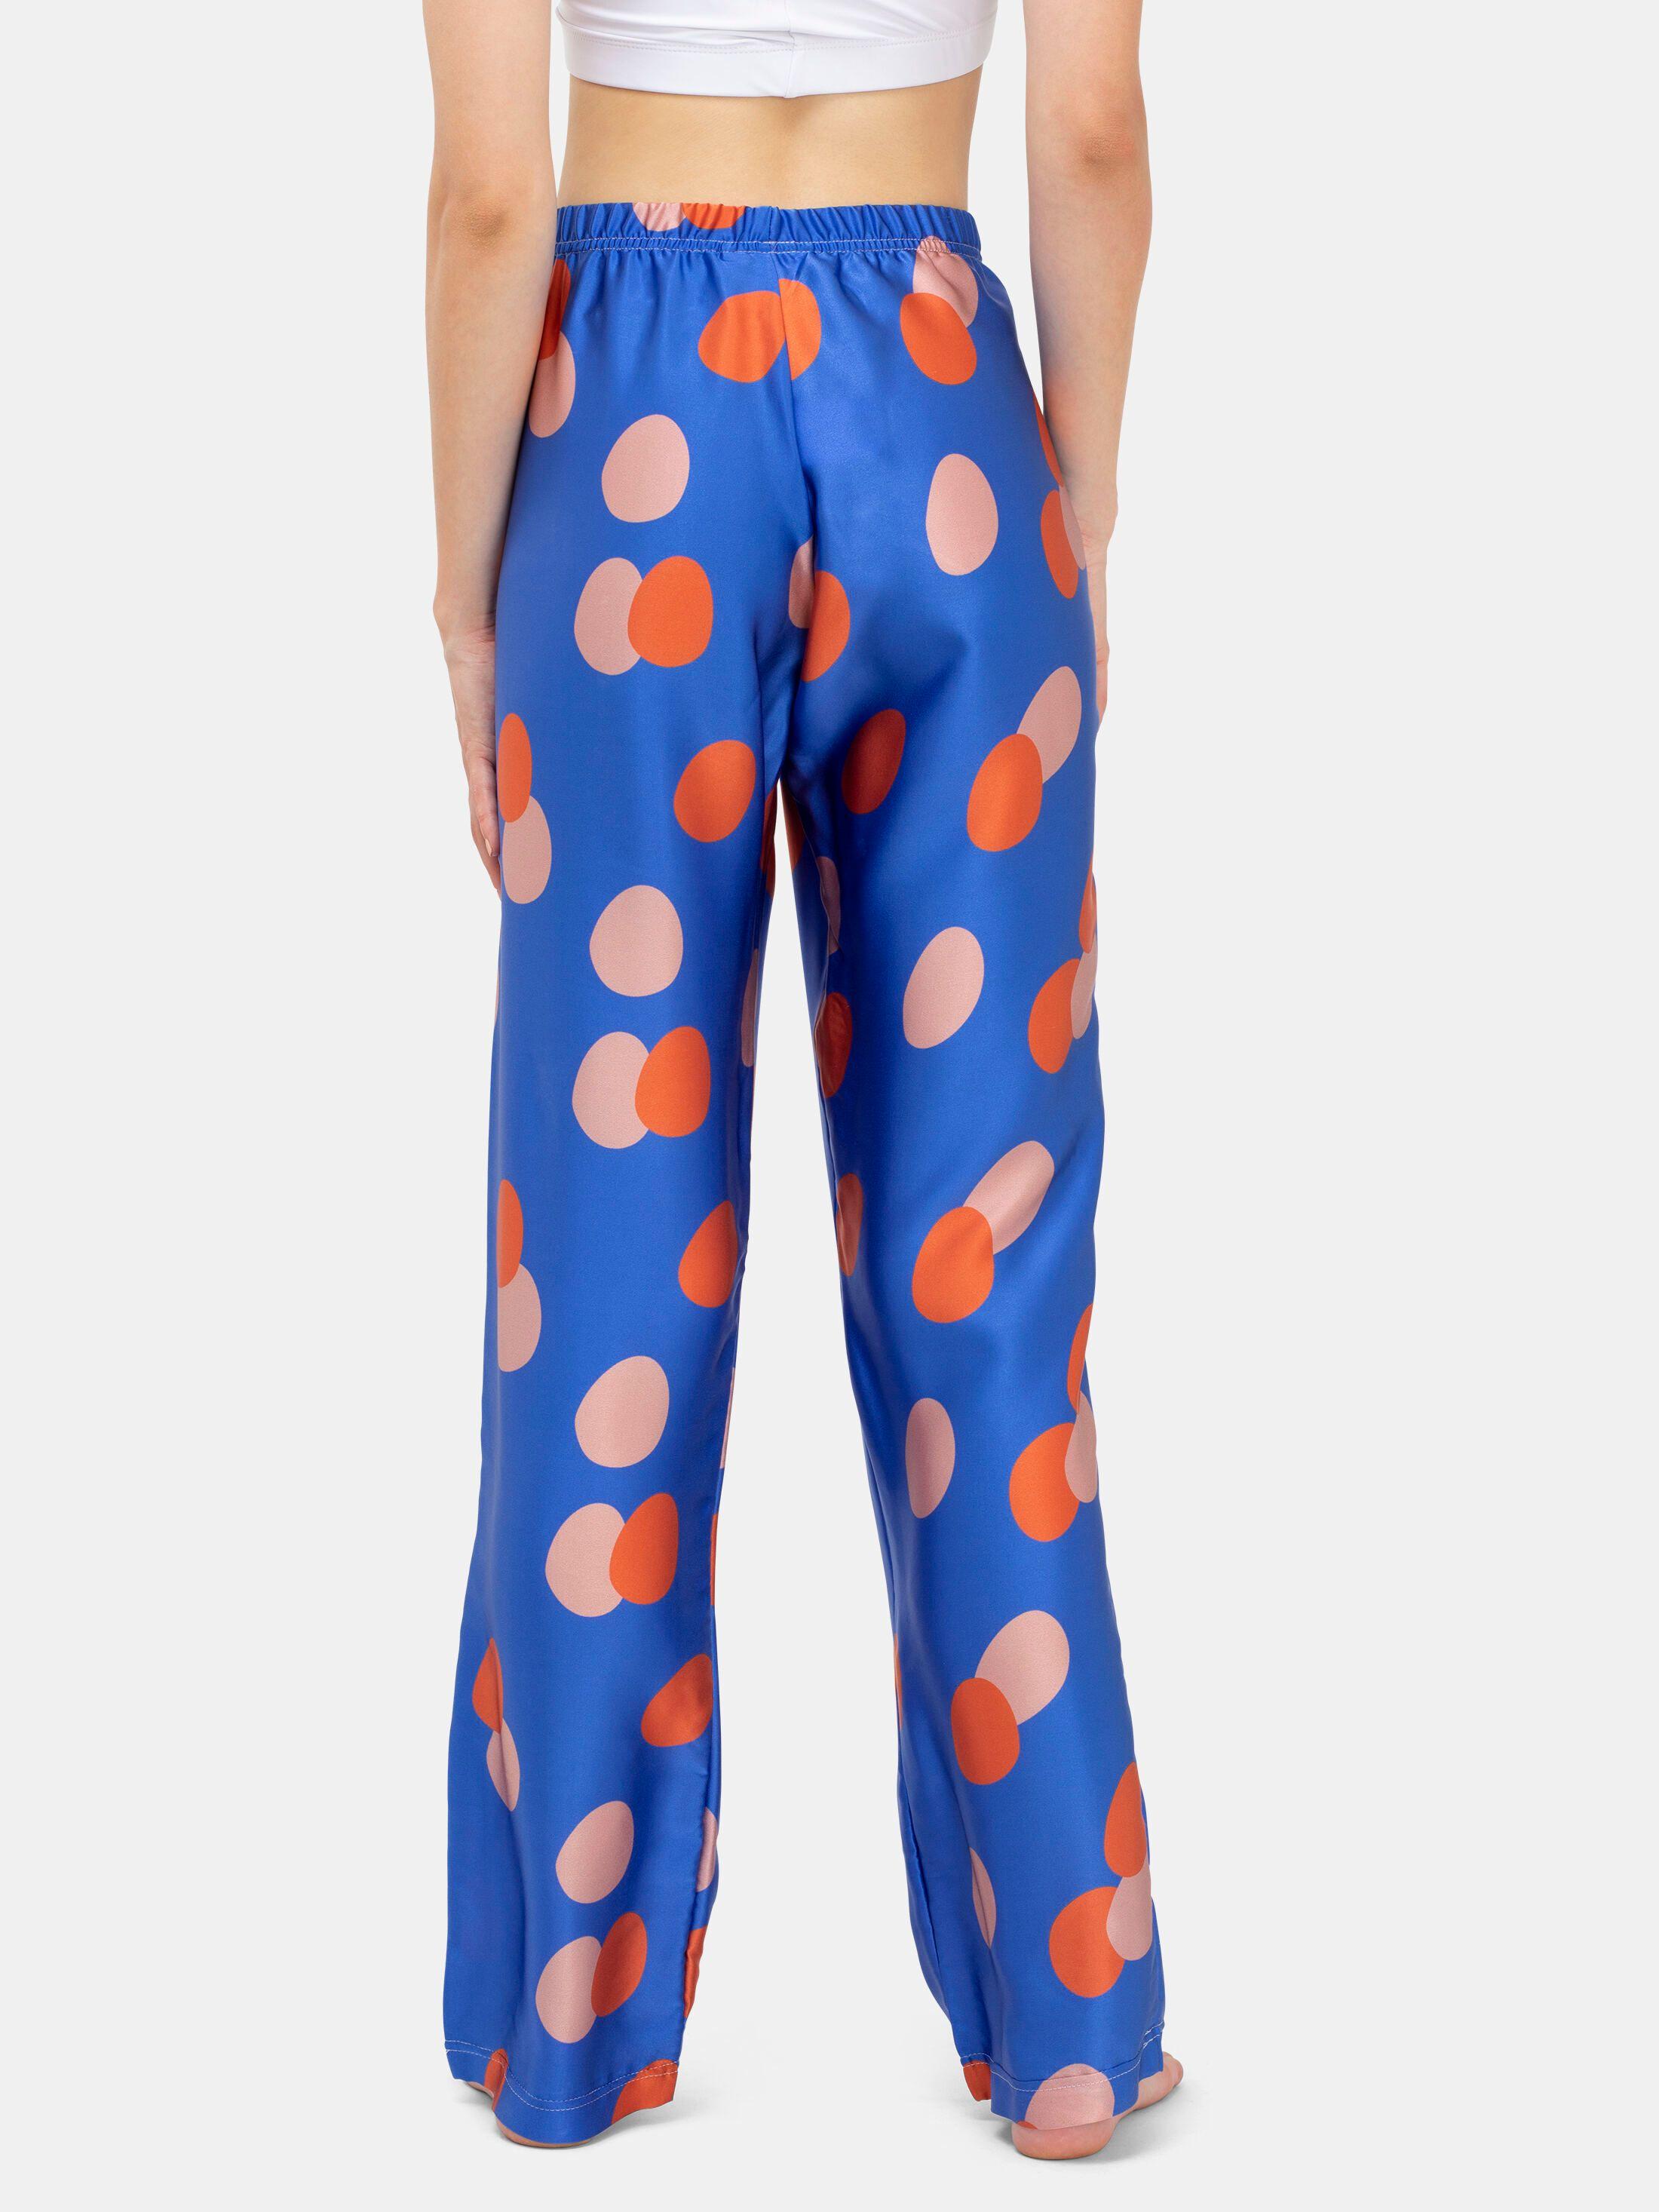 pantalon pijama personalizado corto